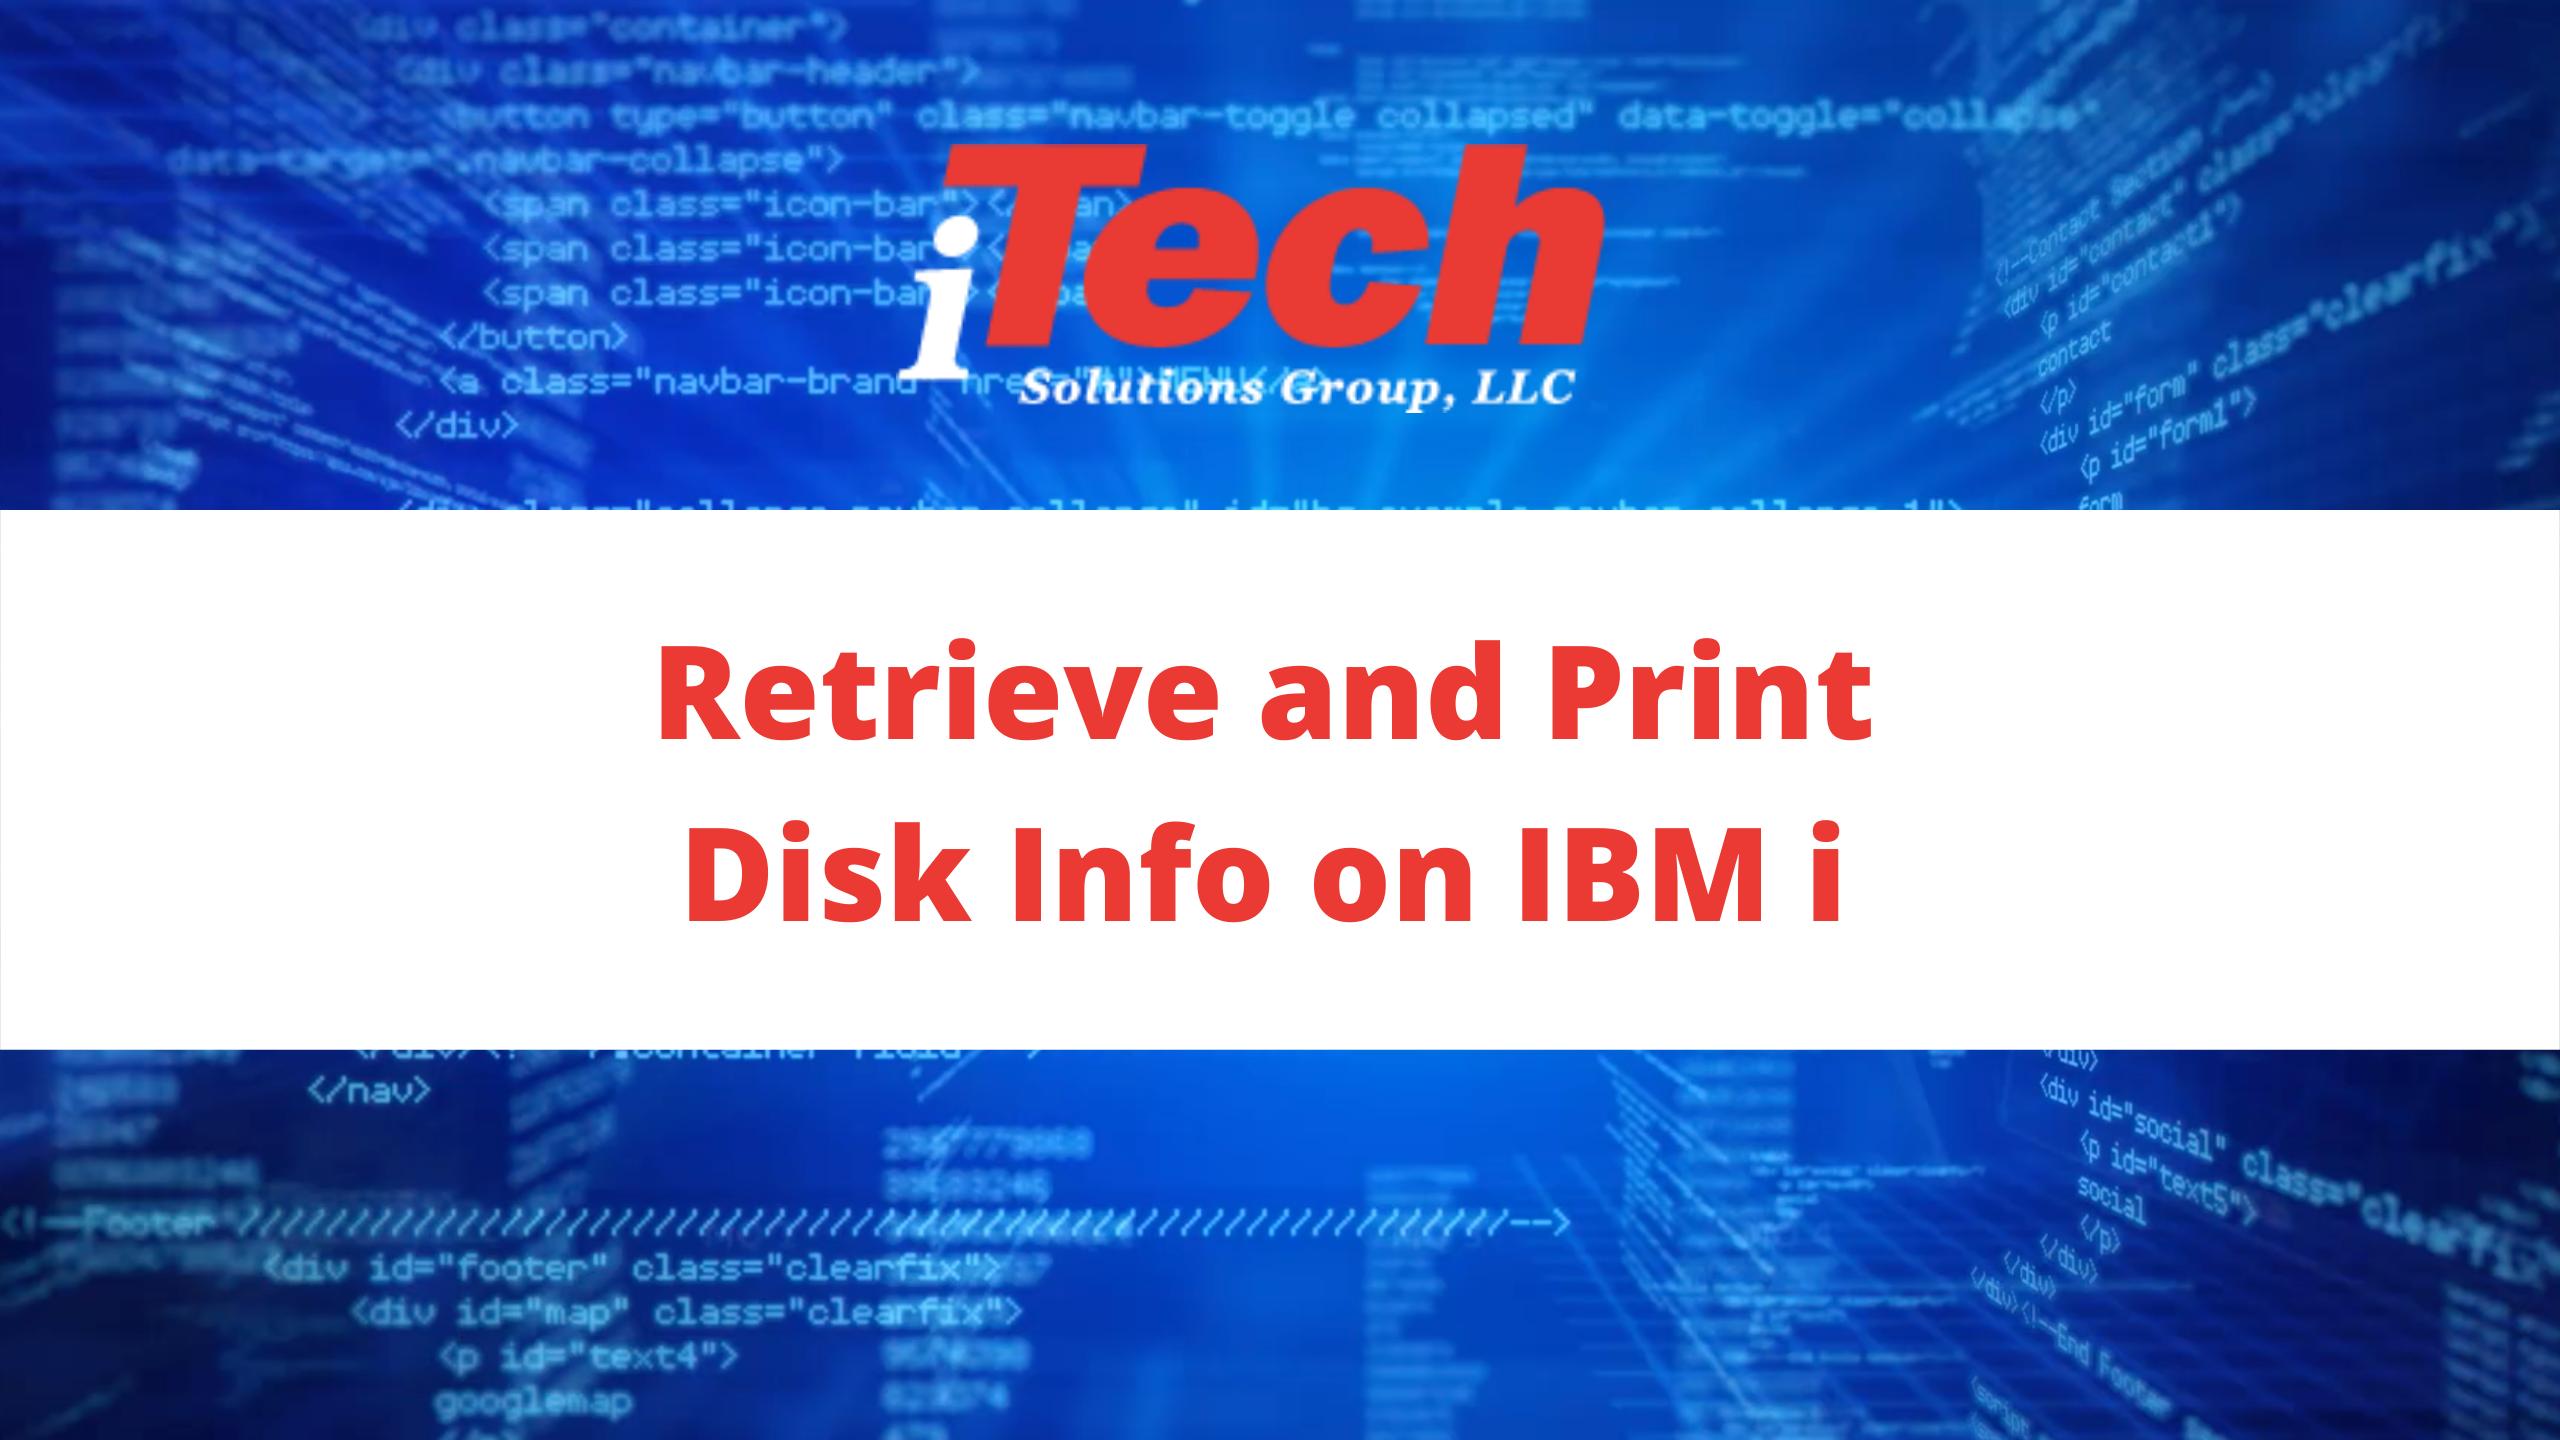 Youtube_ Retrieve and Print Disk Info on IBM i